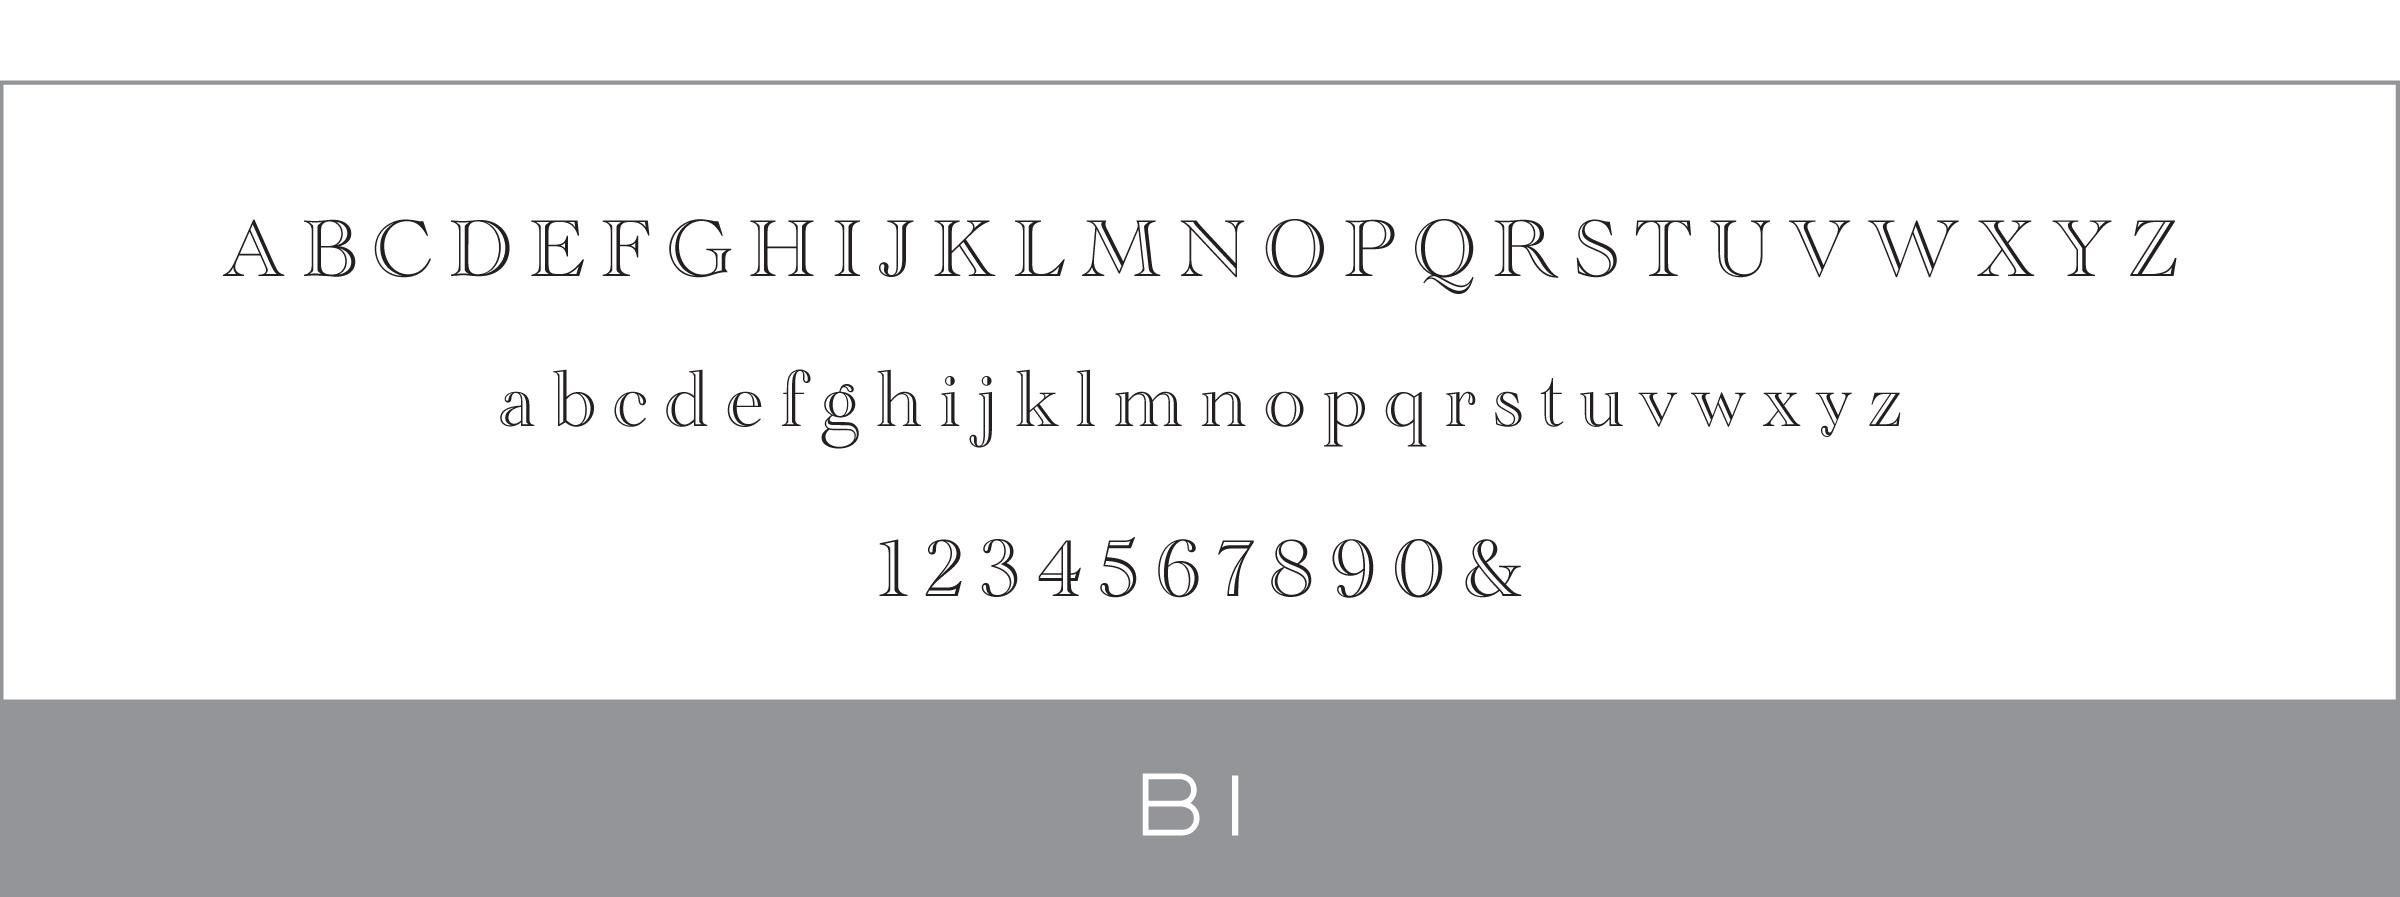 B1_Haute_Papier_Font.jpg